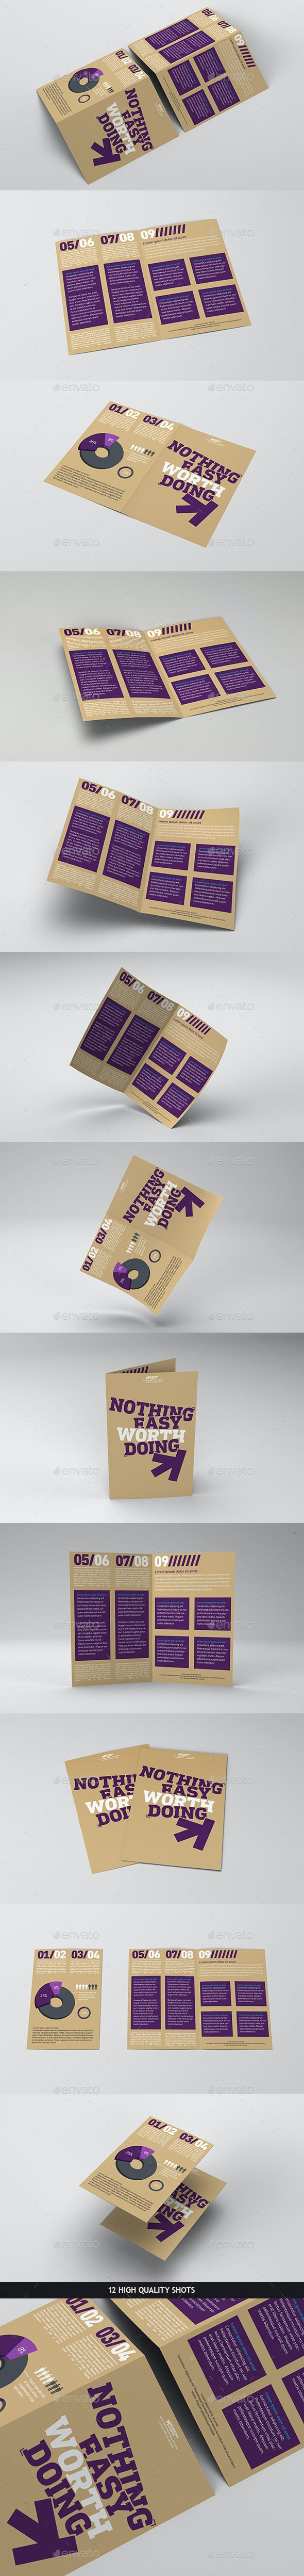 Bi-fold Brochure Mockup Pack - Brochures Print